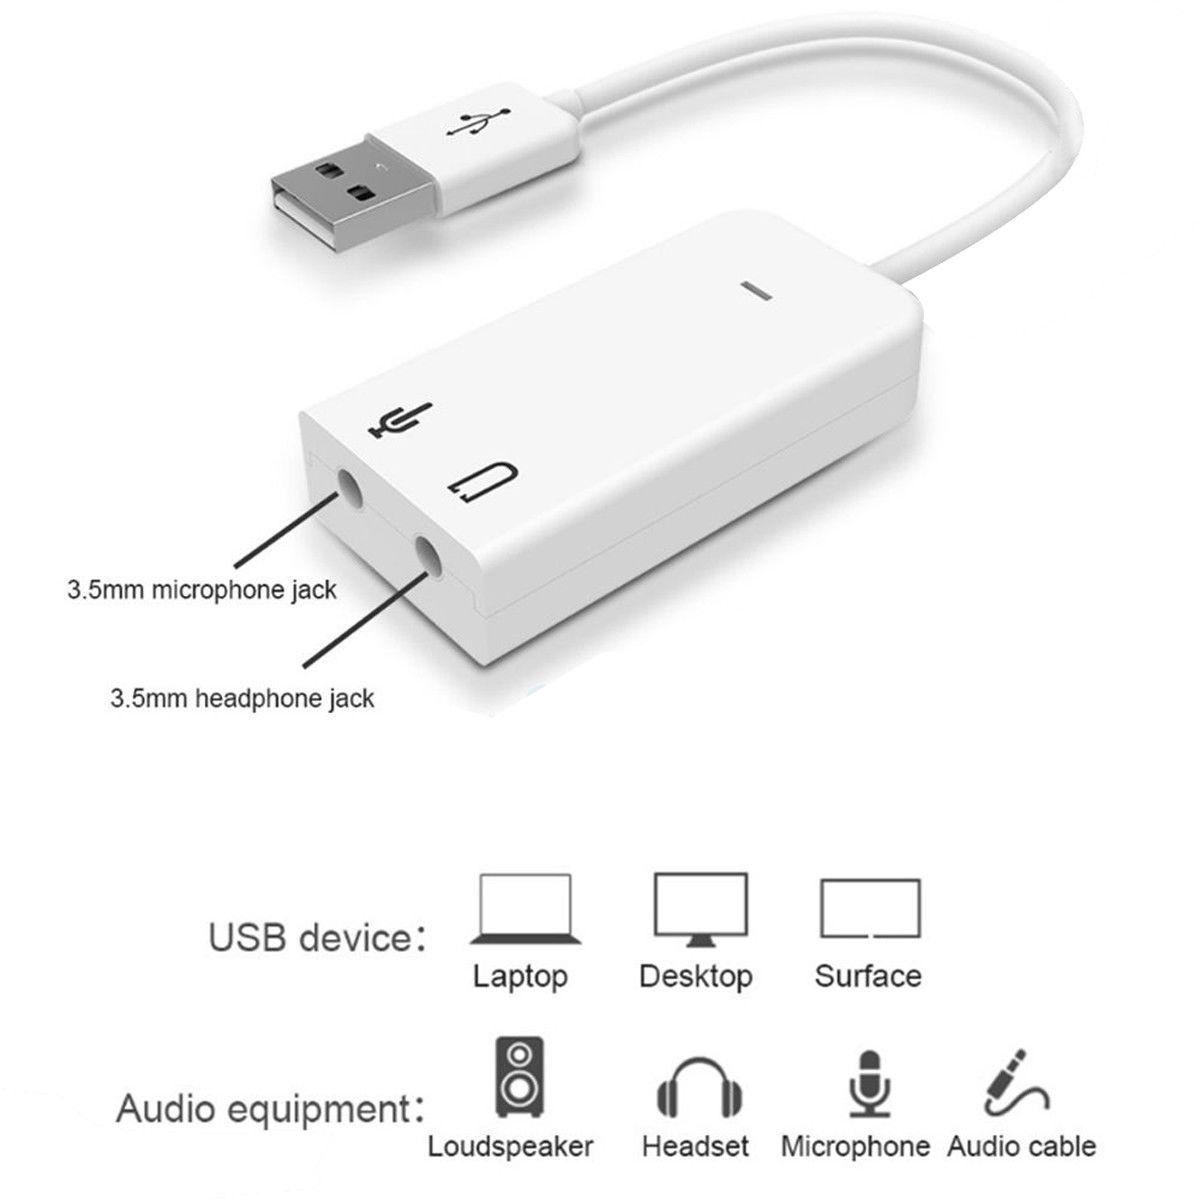 External Usb 20 3d Virtual 71 Channel Audio Sound Card Adapter For Description